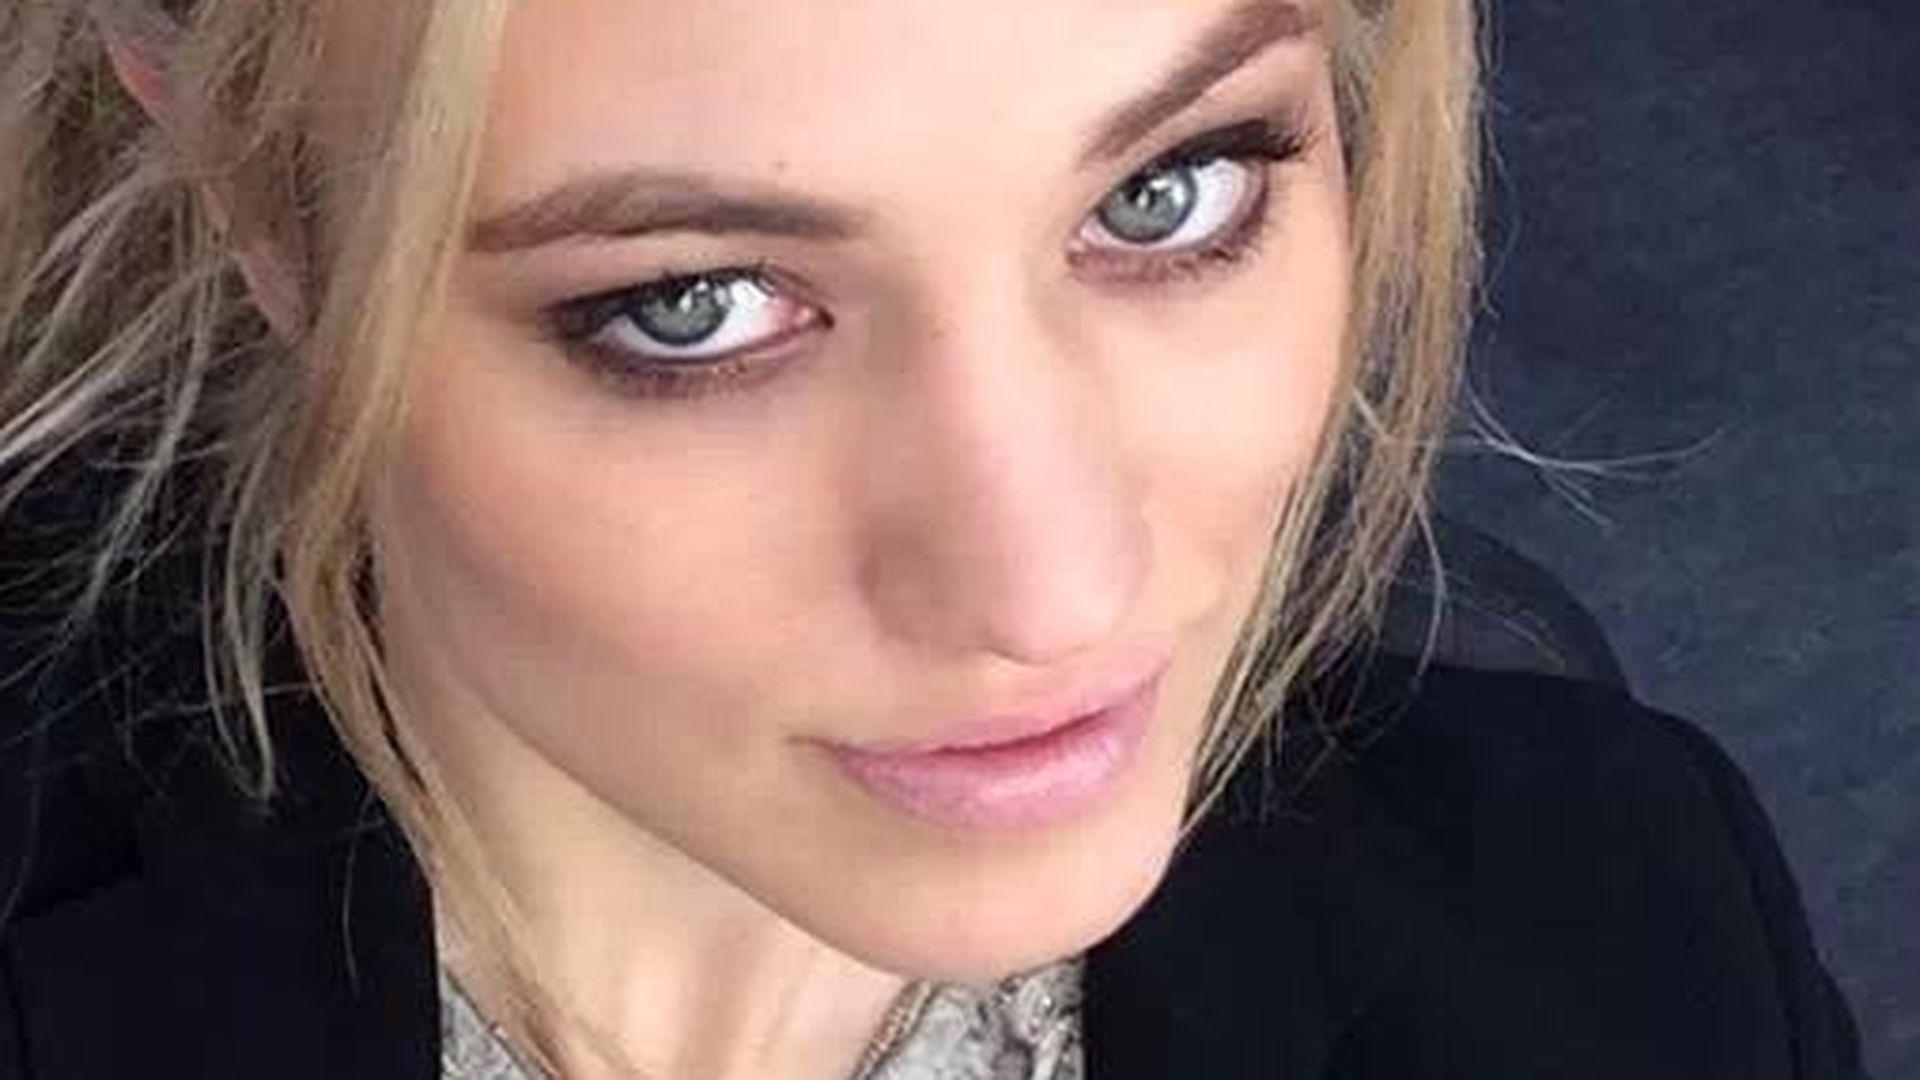 Larissa Bonesi Wiki-Biography-Age-Weight-Height-Profile